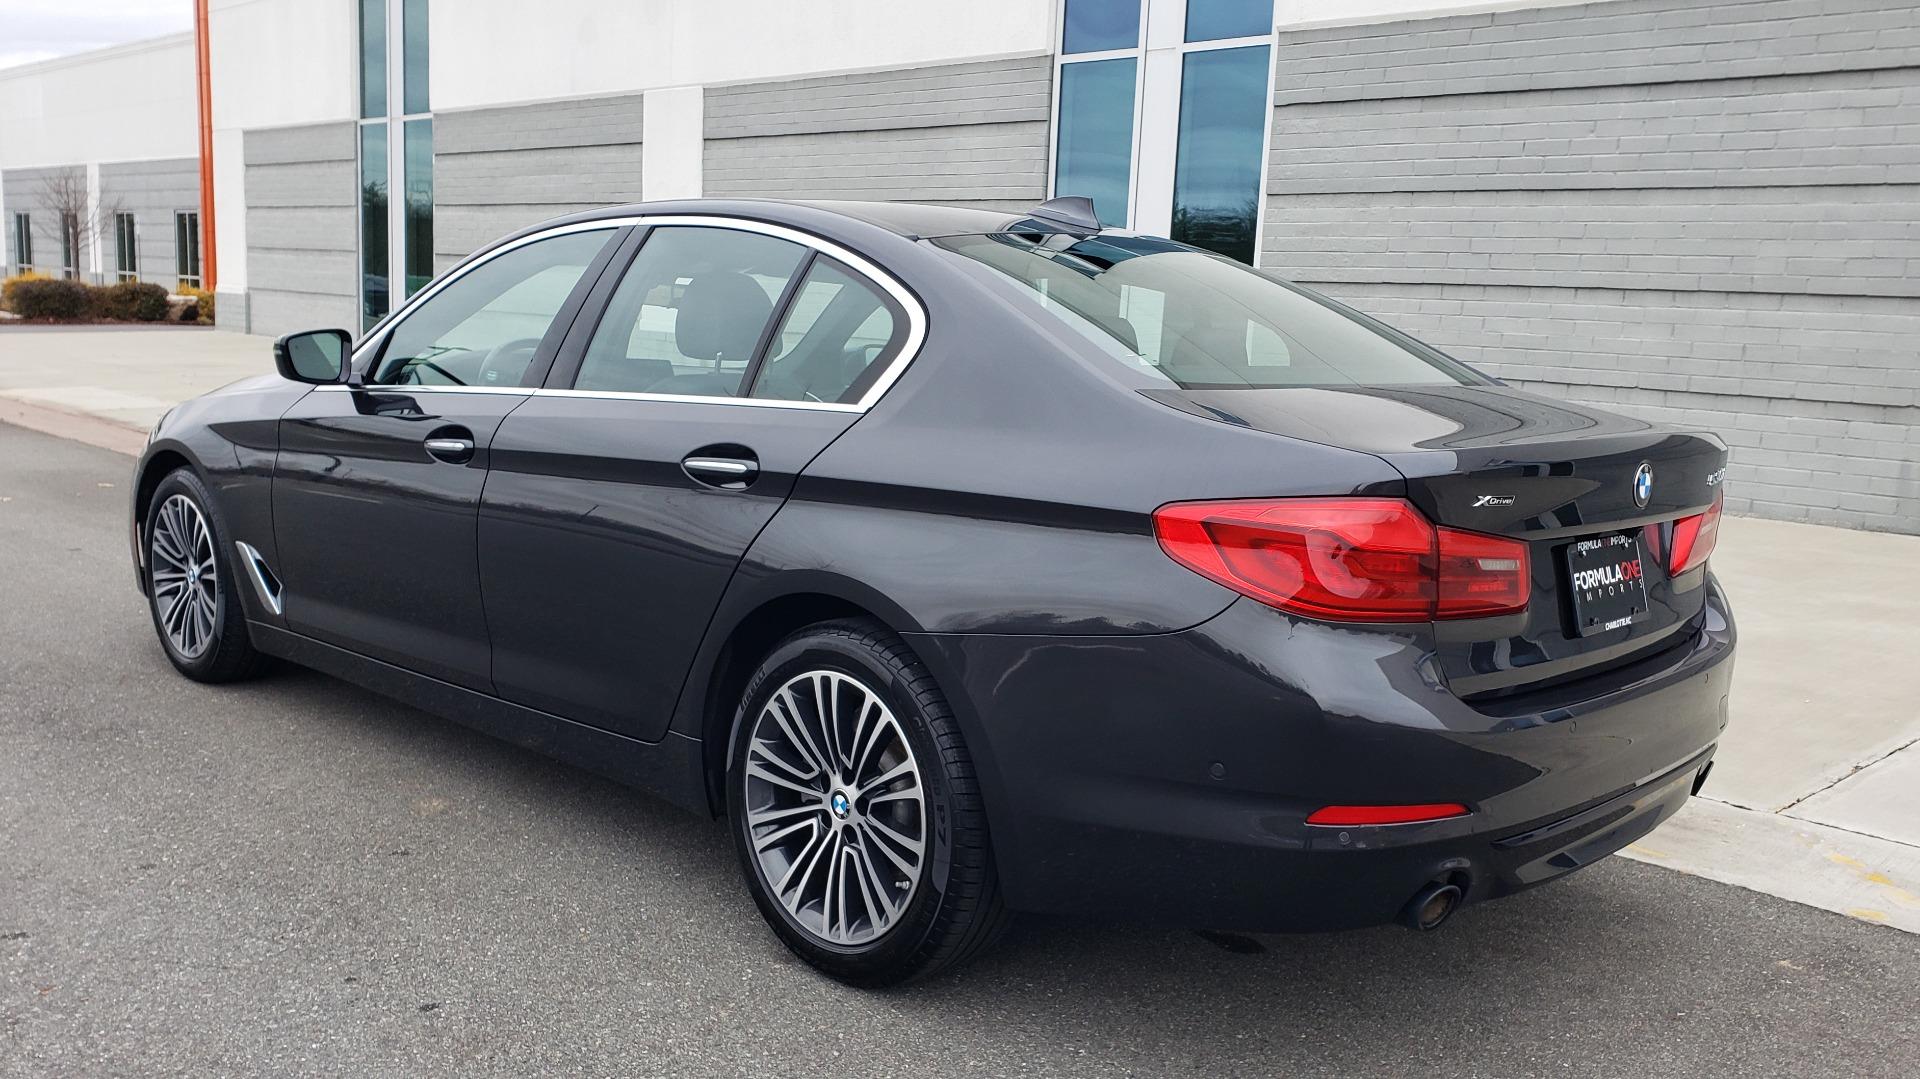 Used 2017 BMW 5 SERIES 530IXDRIVE / PREM PKG / DRVR ASST PLUS / CLD WTHR / APPLE CARPLAY for sale Sold at Formula Imports in Charlotte NC 28227 3